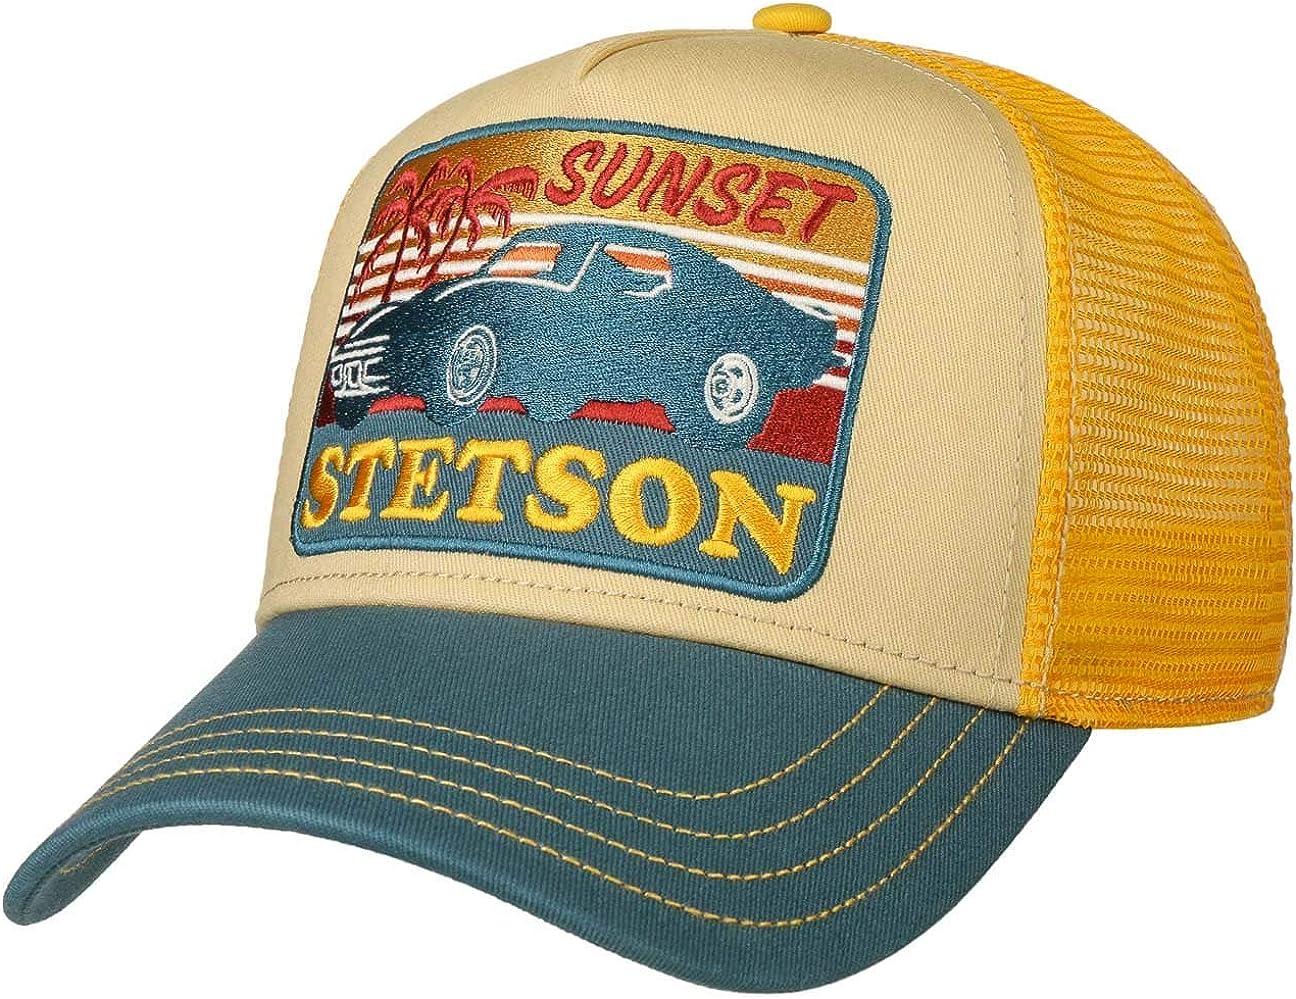 Stetson Gorra American Heritage Trucker Hombre - de Malla Beisbol Snapback Cap Snapback, con Visera Verano/Invierno